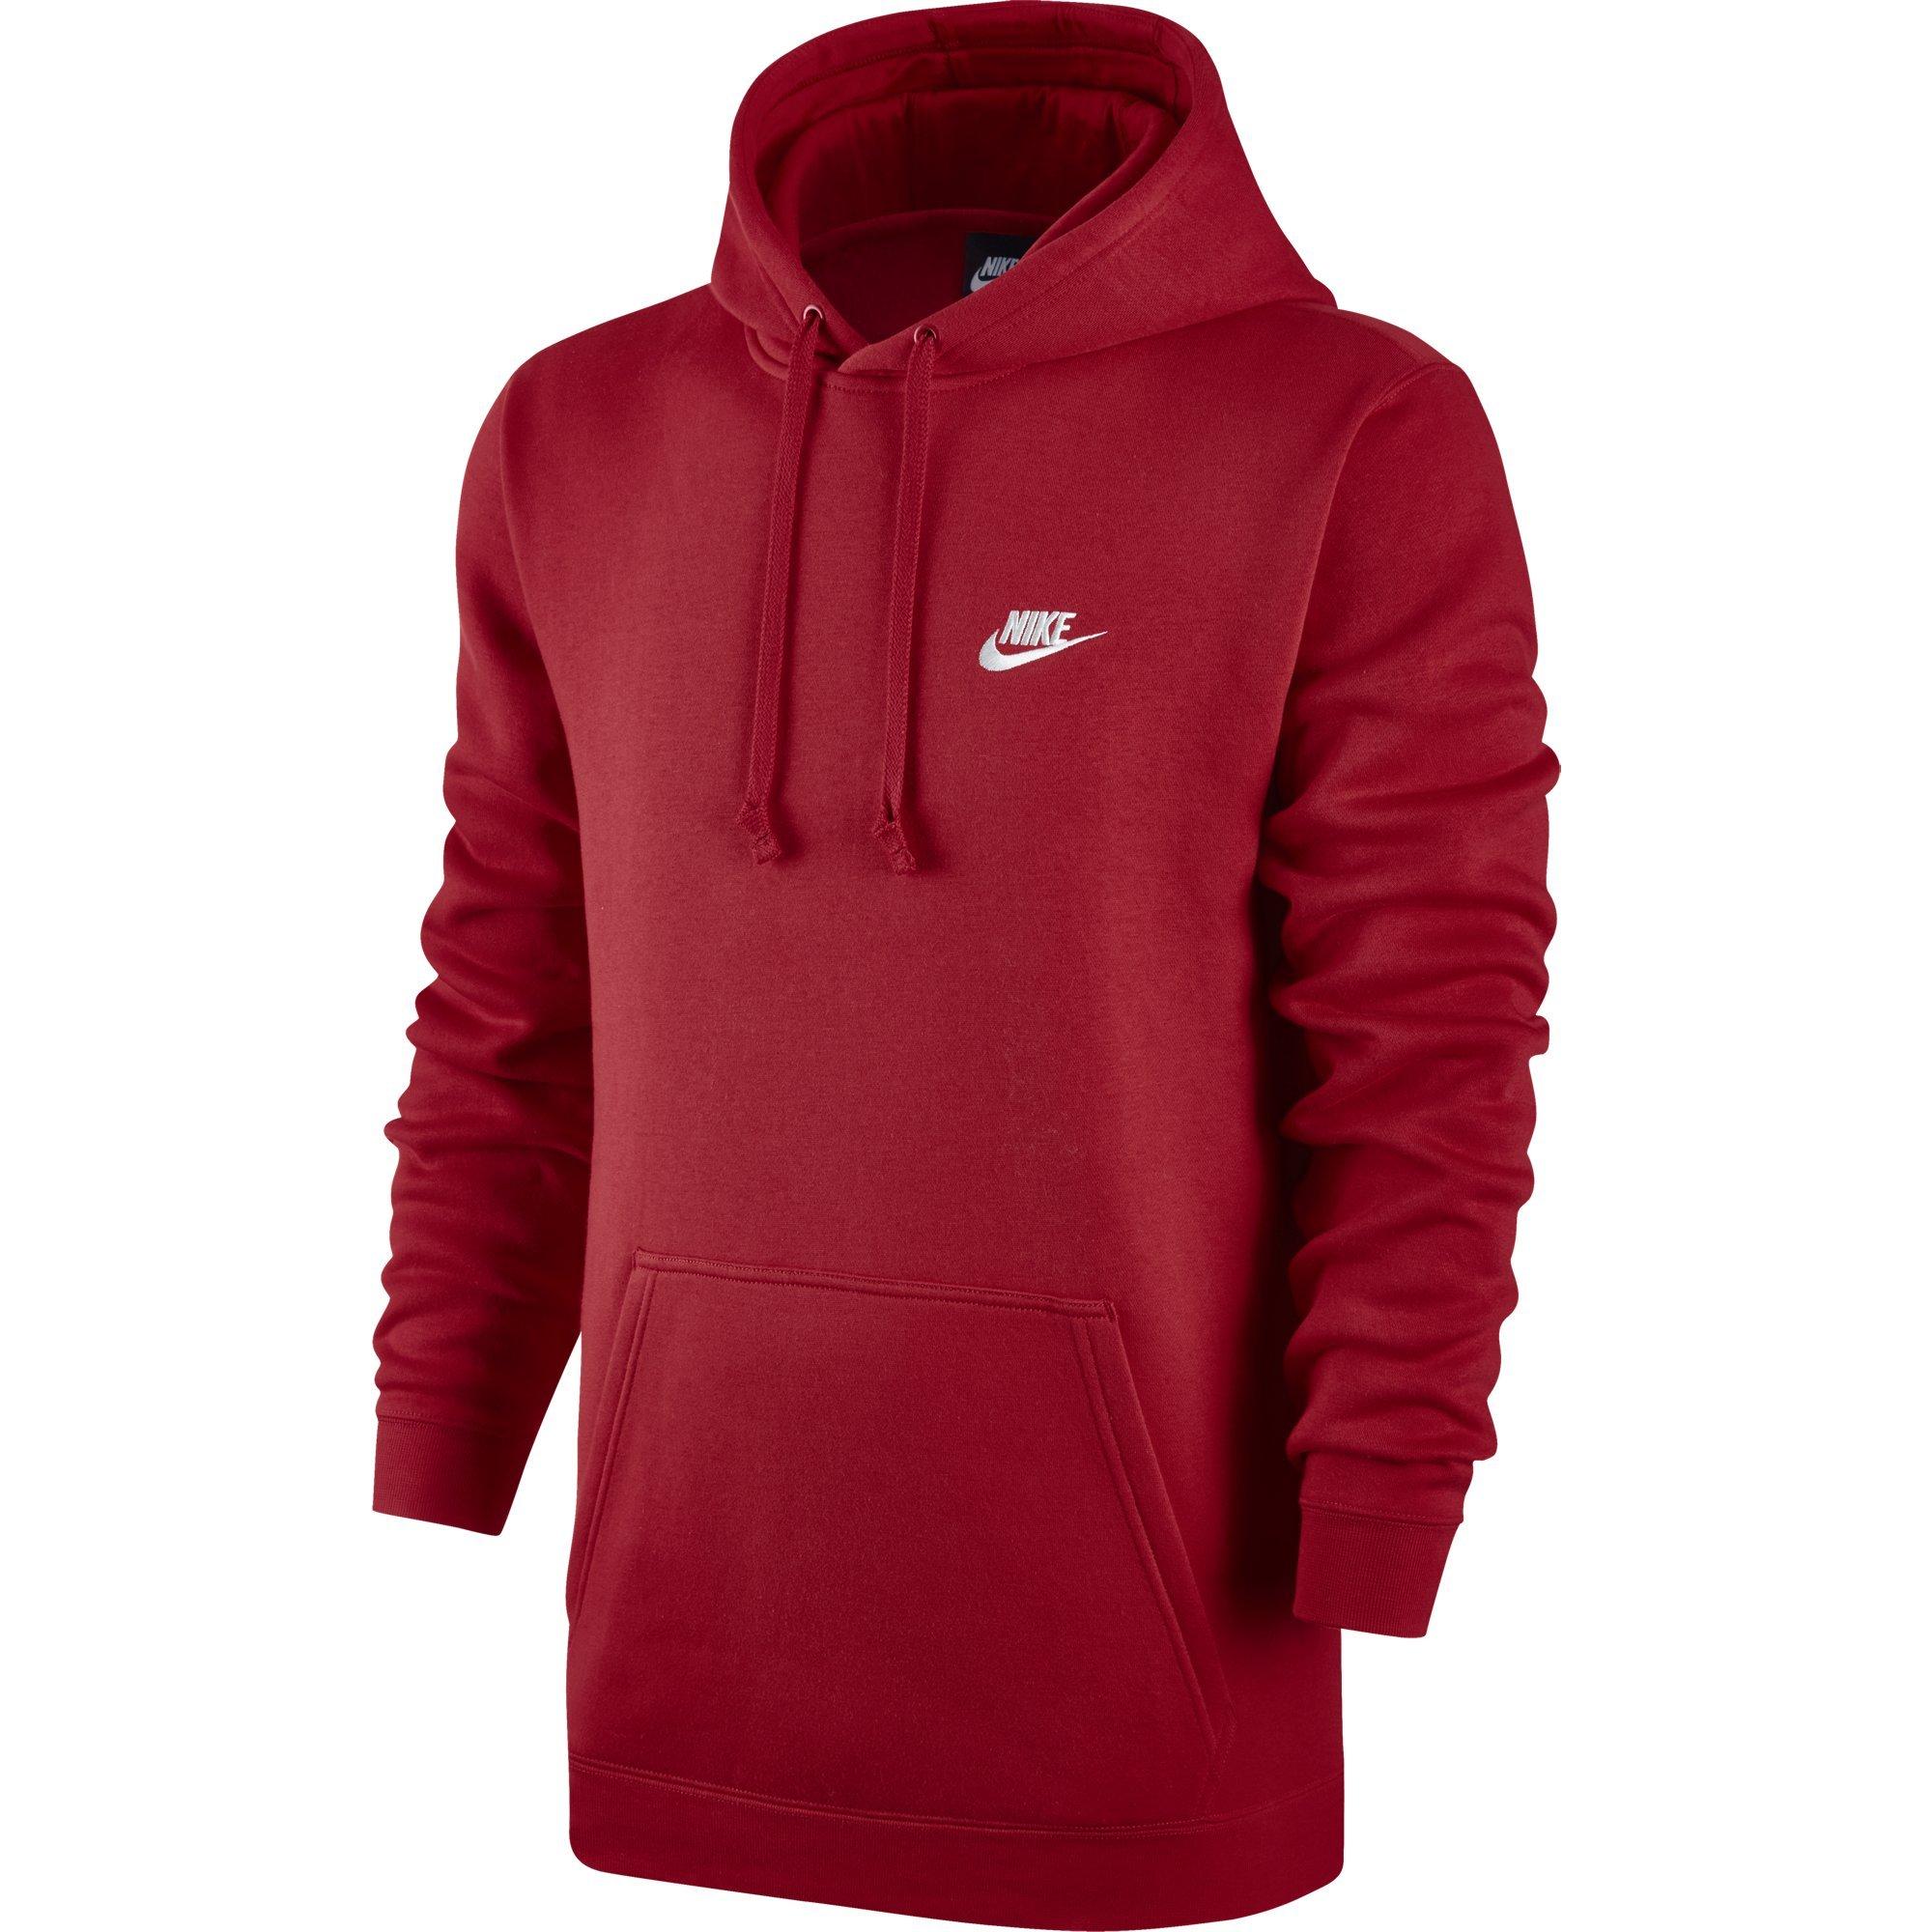 Men's Nike Sportswear Club Pullover Hoodie, Fleece Sweatshirt for Men with Paneled Hood, University Red/University Red/White, S